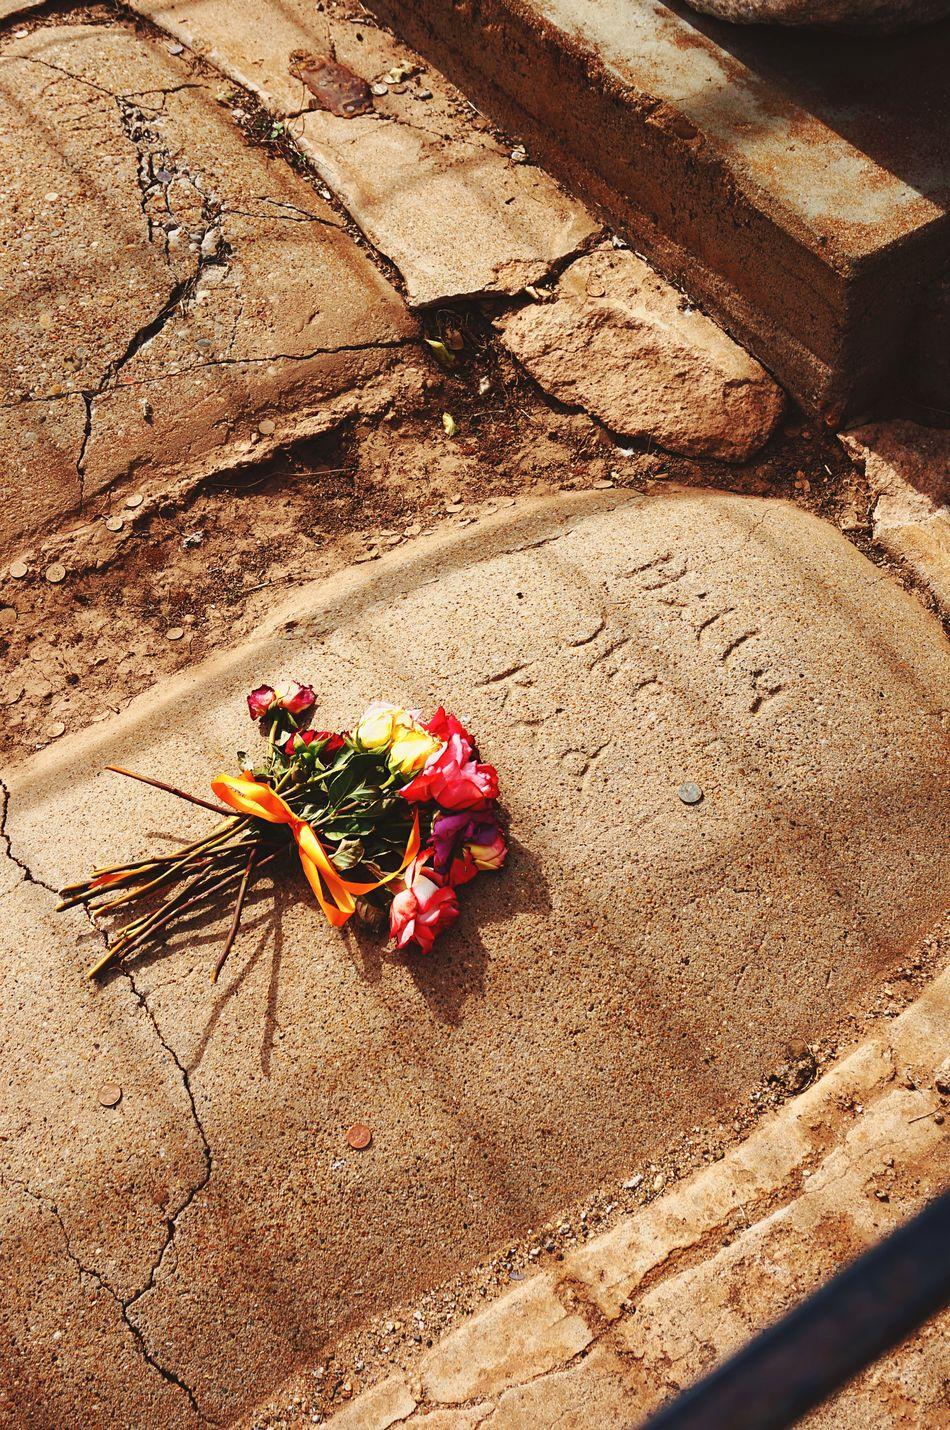 R.I.P Billy the Kid Billythekid Billy The Kid Tombstone New Mexico USA EyeEm Best Edits Eye4photography  Travel Photography EyeEmBestPics EyeEm Best Shots